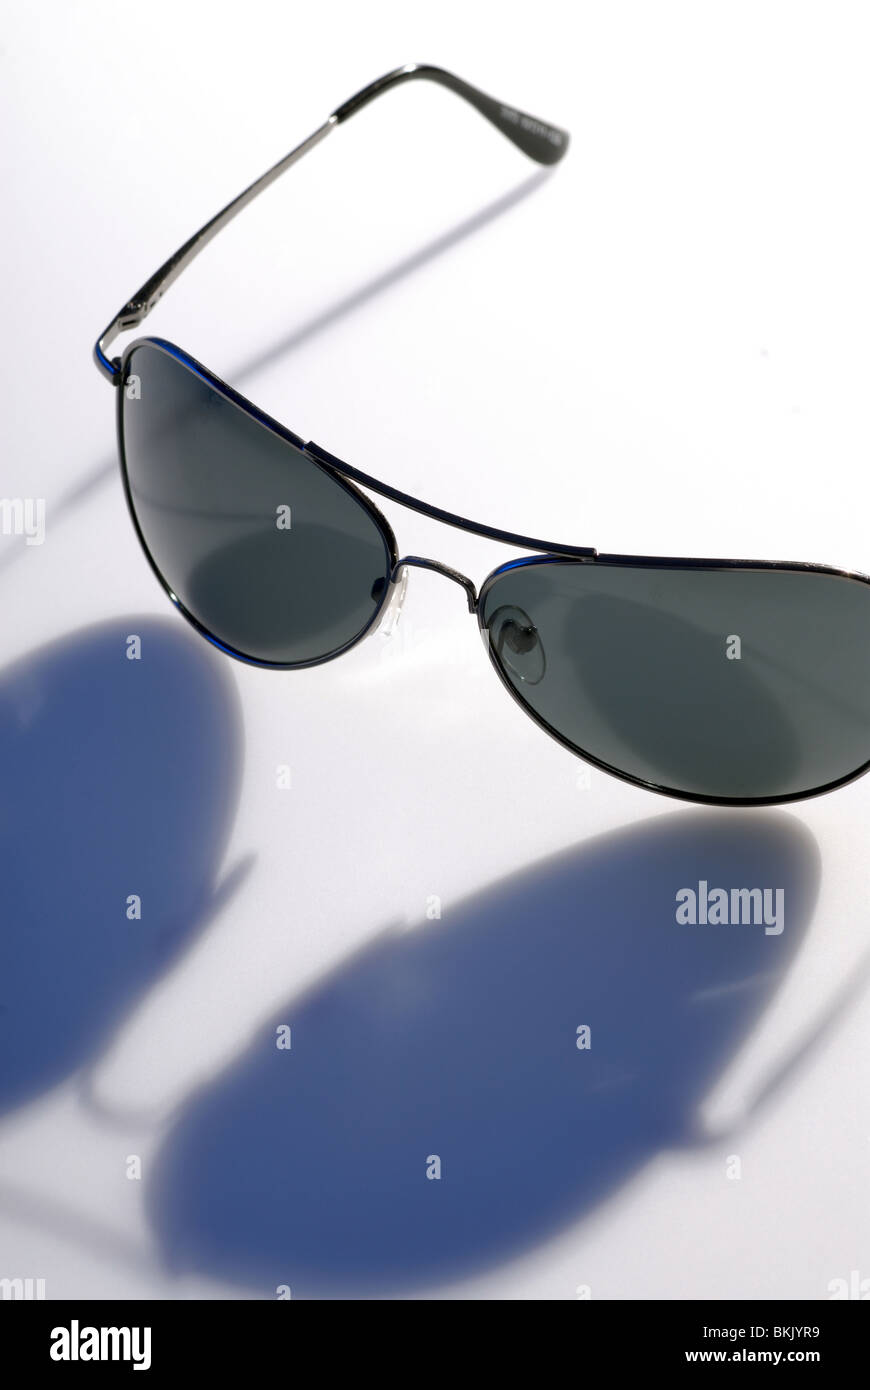 968bfa03cf50f Ray-Ban aviator sunglasses isolated in studio Stock Photo  29305789 ...